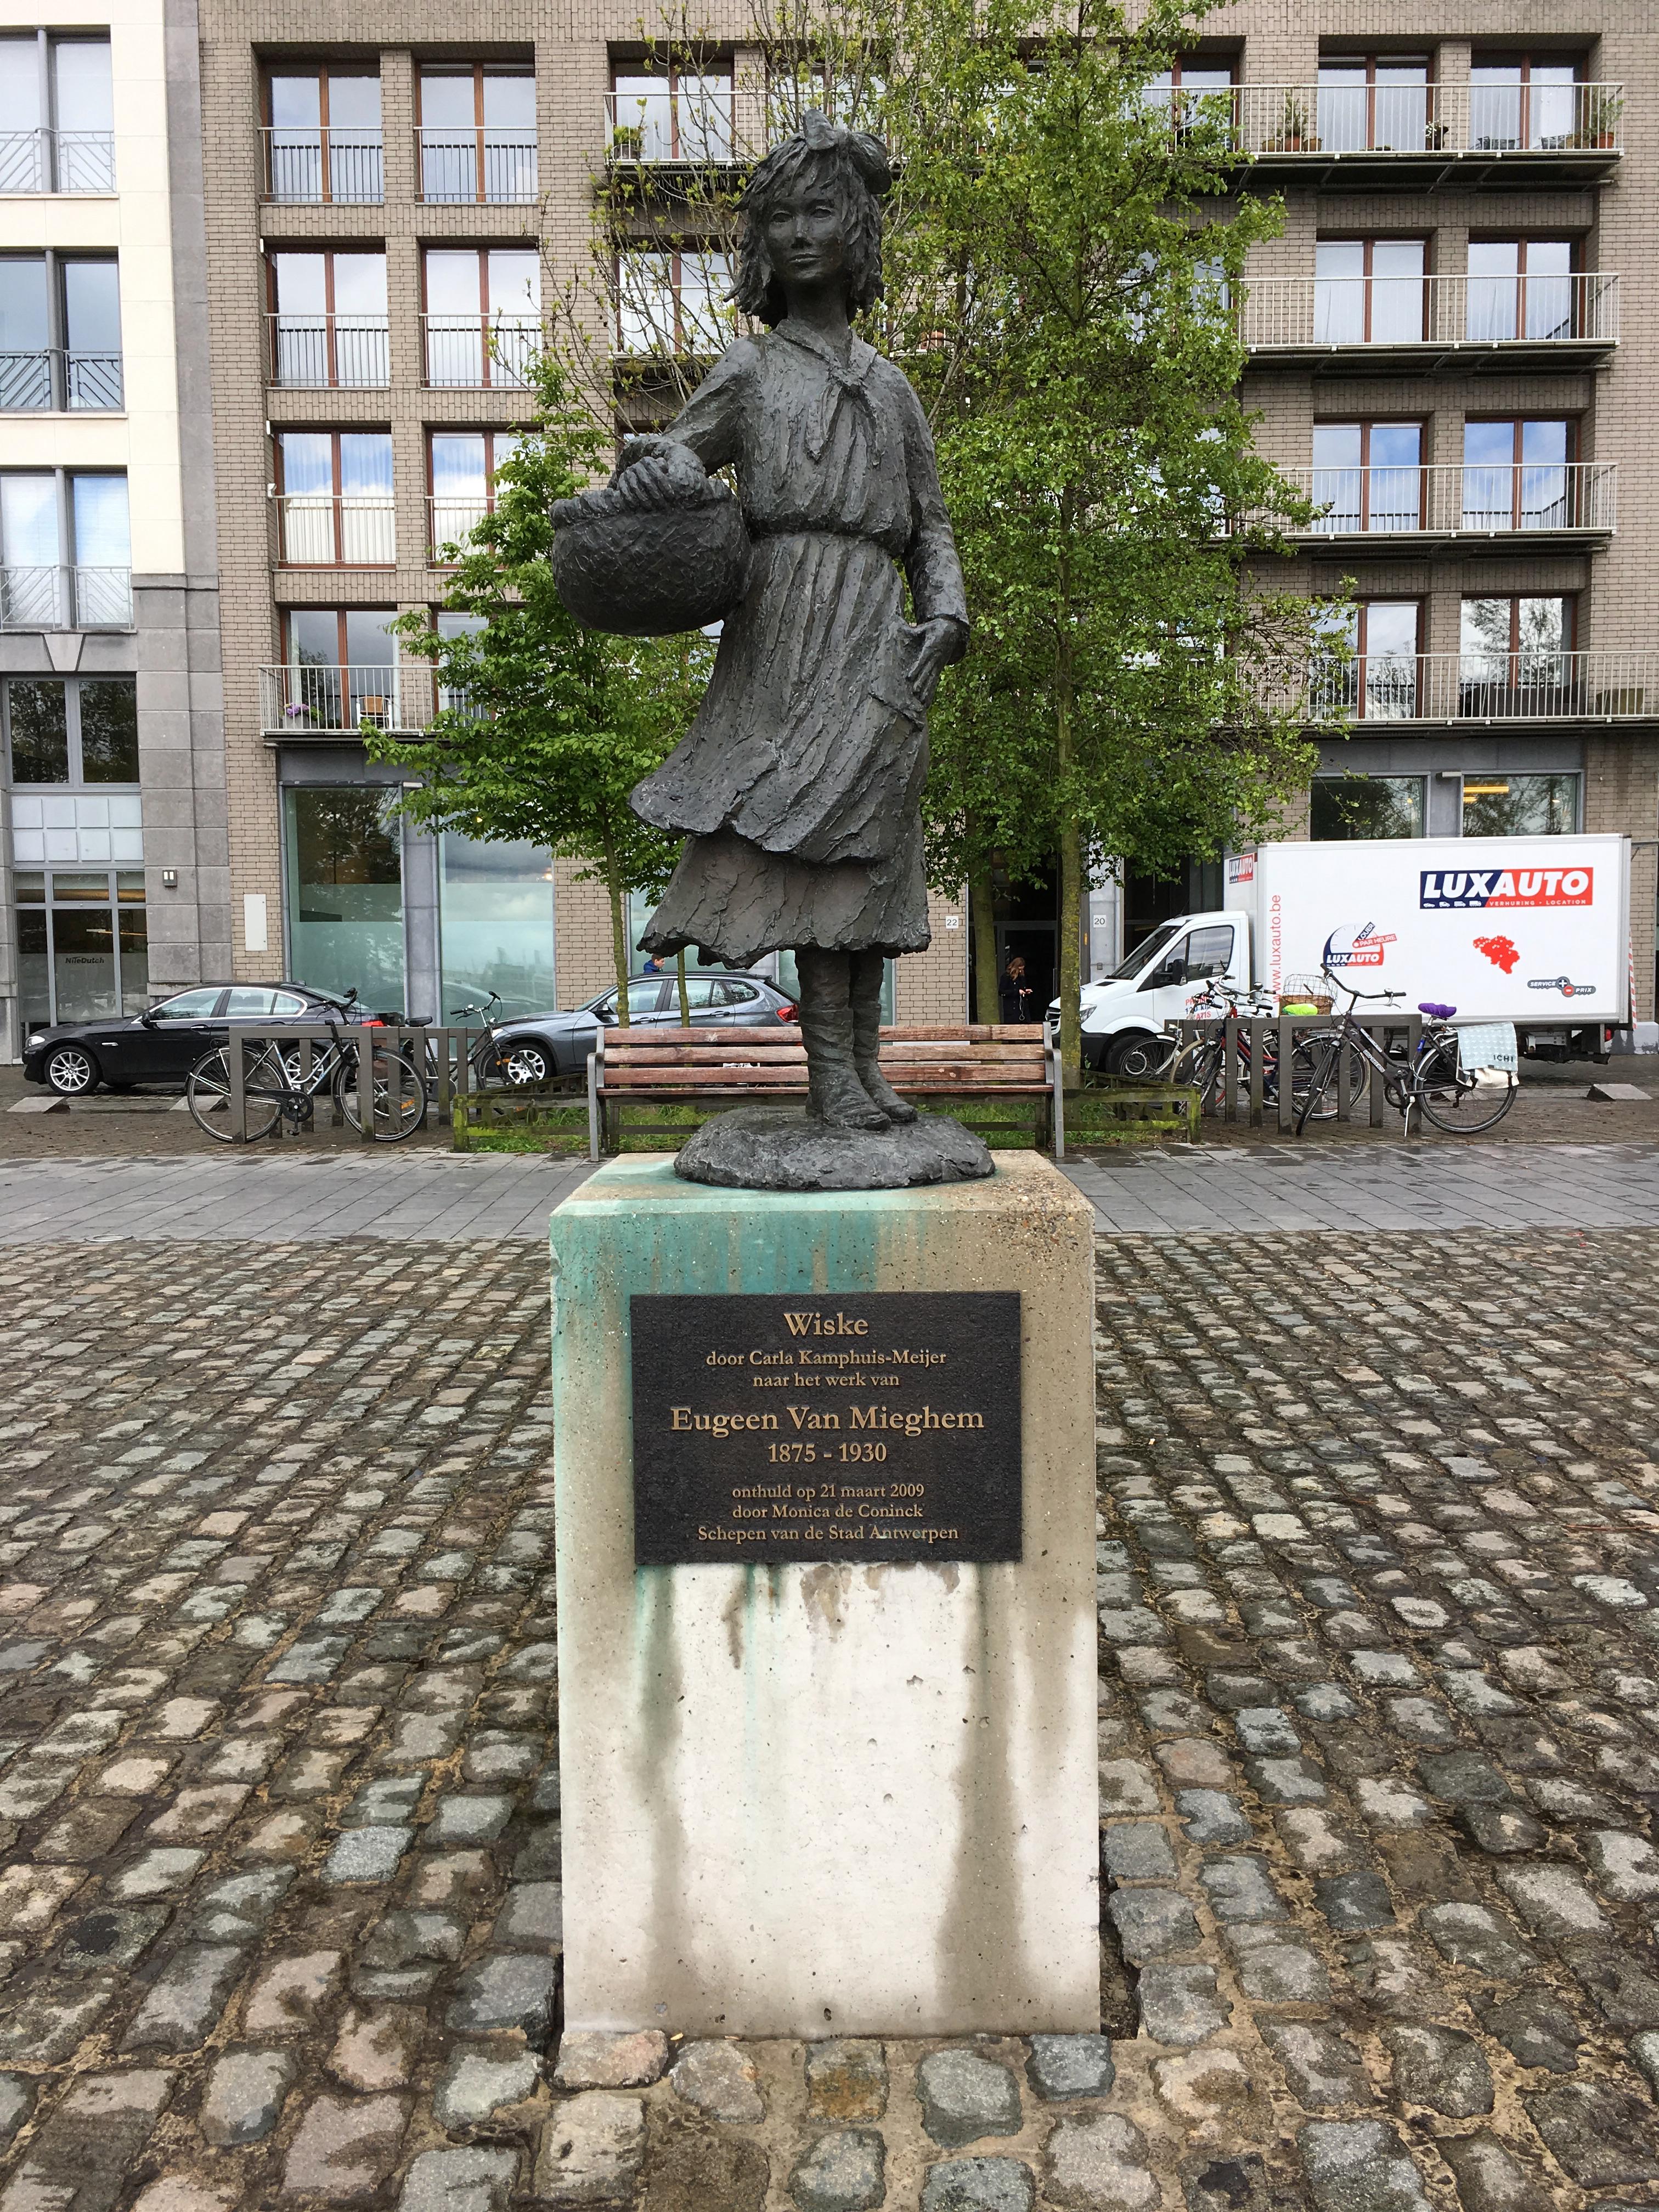 File:Carla Kamphuis-Meijer en Eugeen Van Mieghem - Wiske - Antwerpen